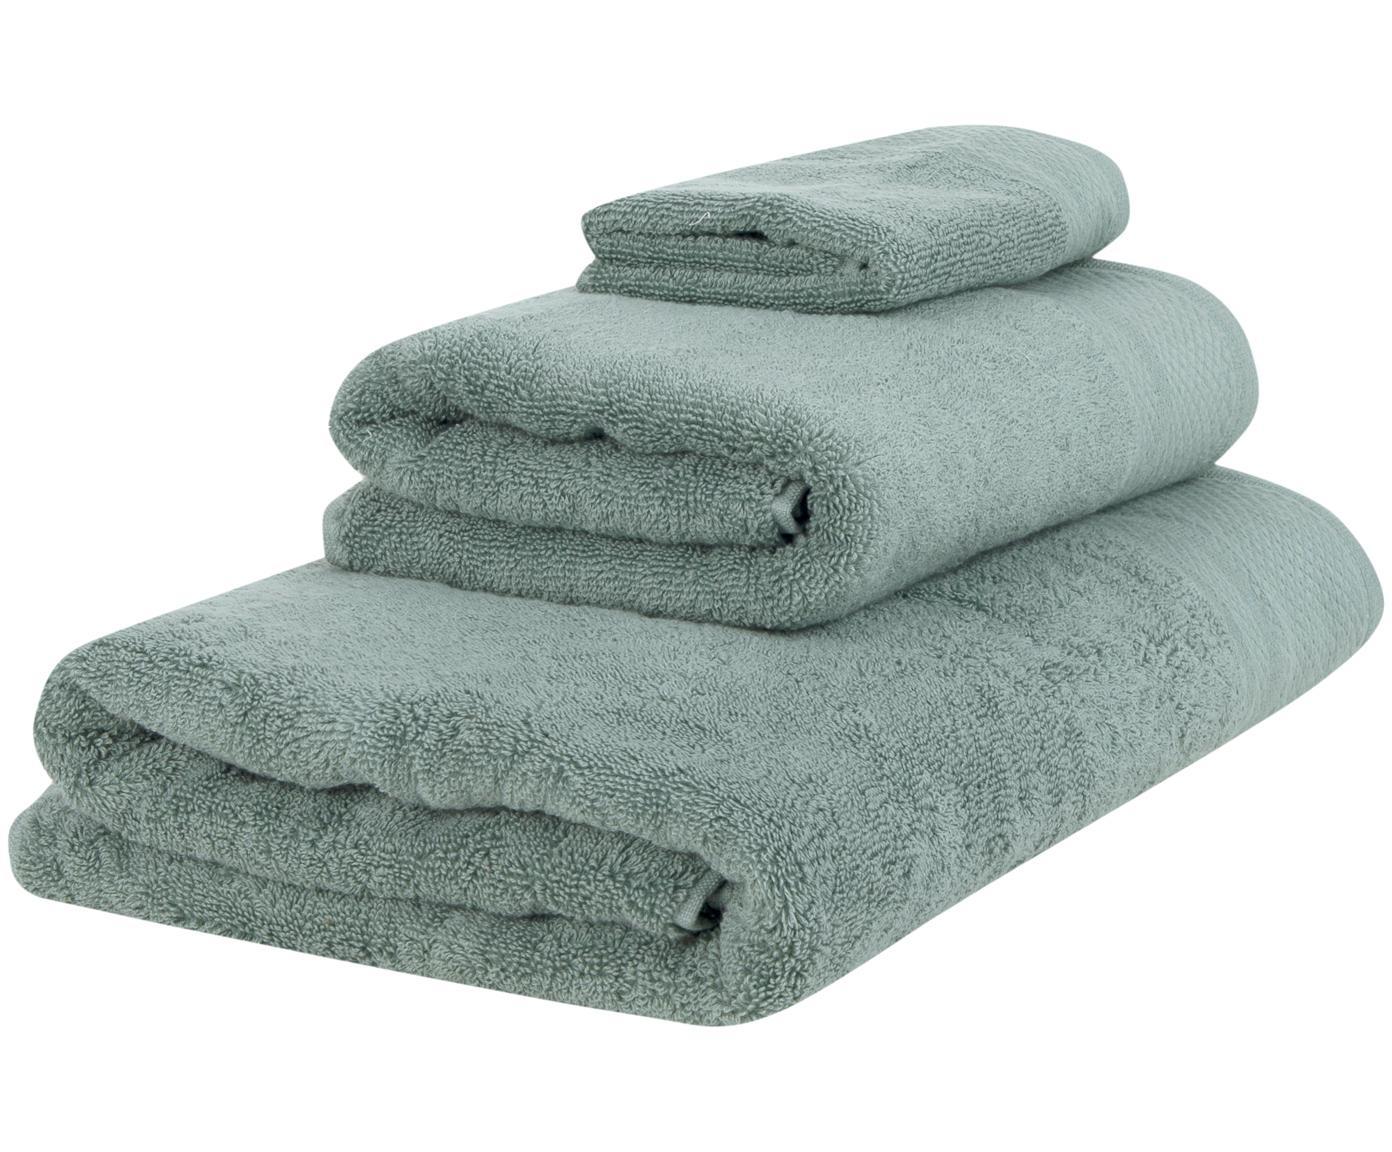 Set de toallas Premium, 3pzas., 100%algodón Gramaje superior 600g/m², Verde salvia, Tamaños diferentes